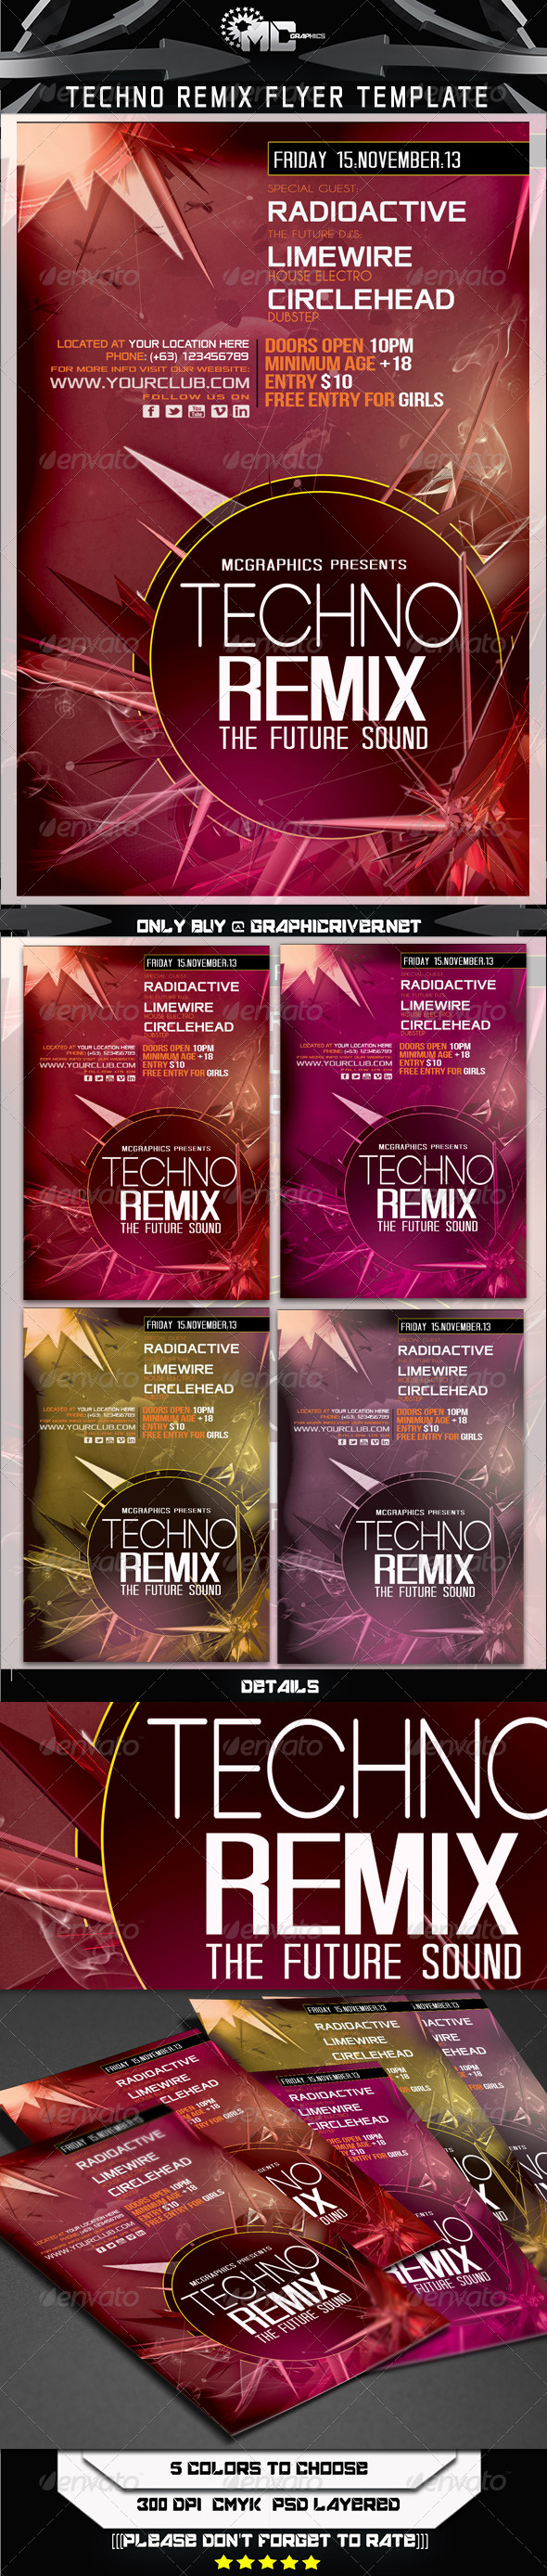 GraphicRiver Techno Remix Flyer Template 5877877